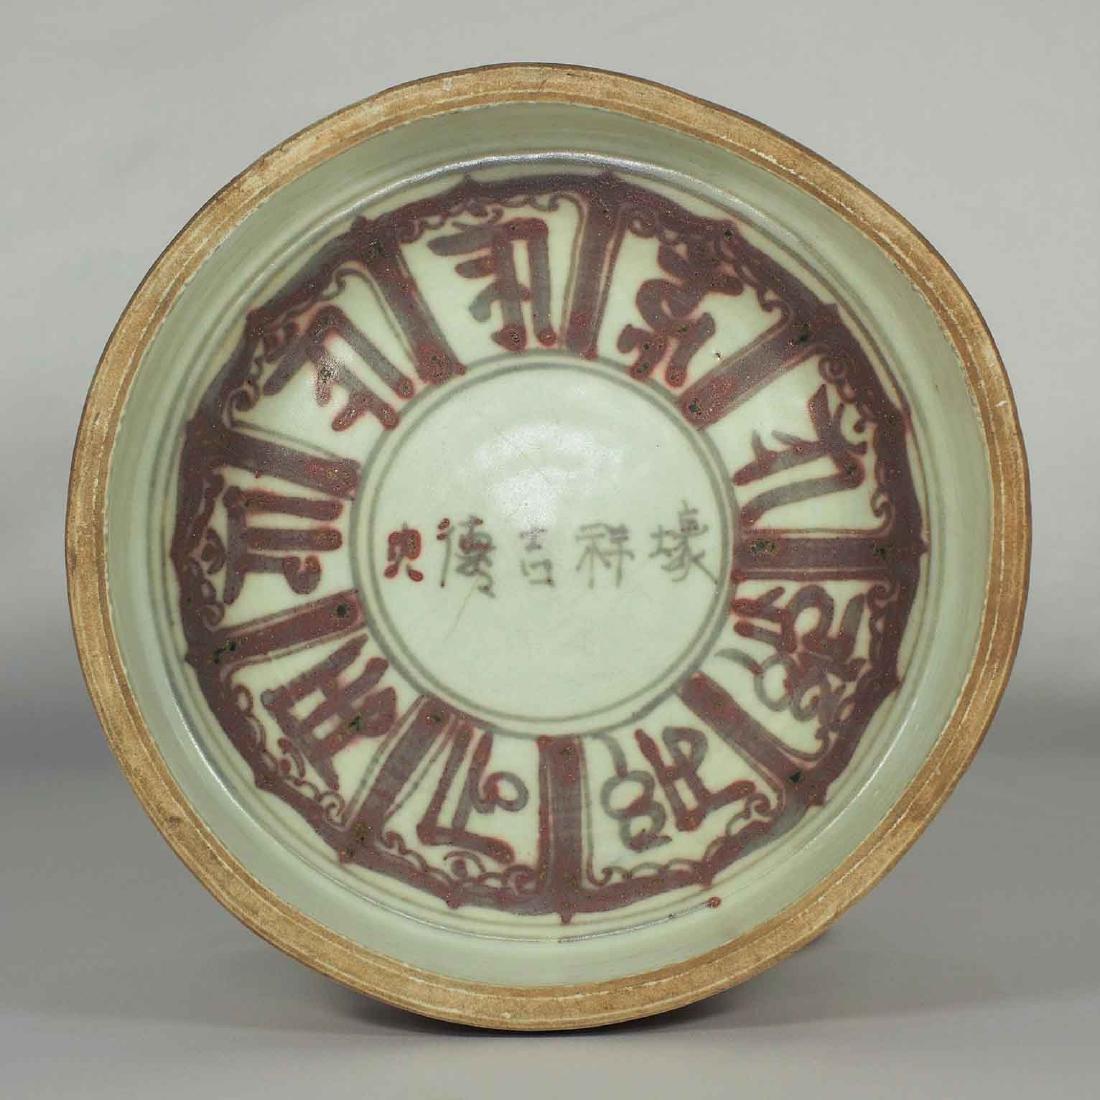 Lidded Jar with Tibetan Script Design, Yongle, Ming - 6